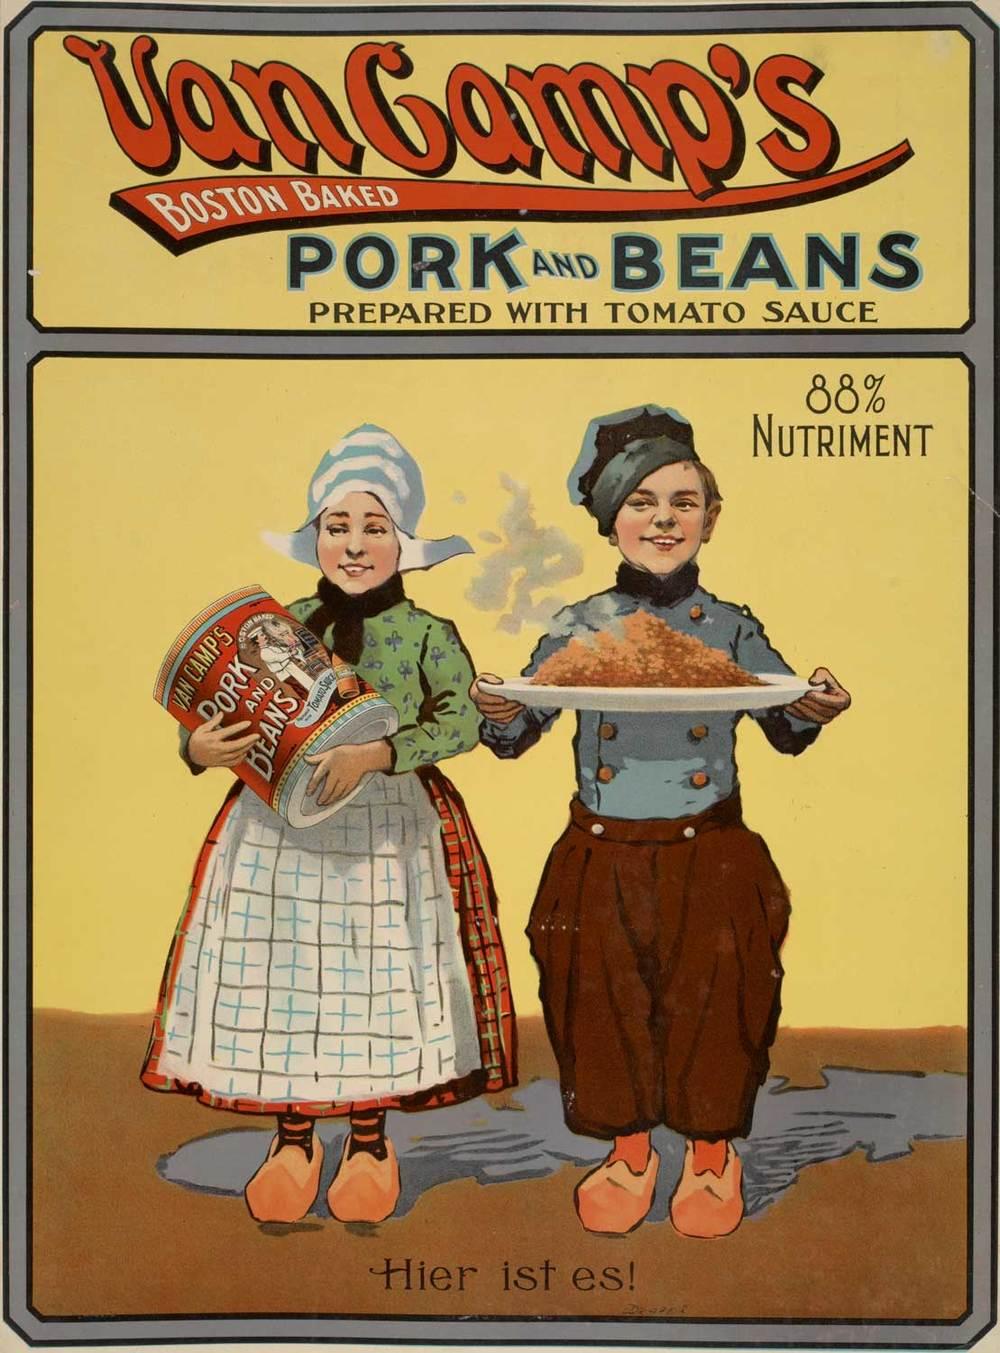 HDFW-PorkNBeans-1500-WEB.jpg